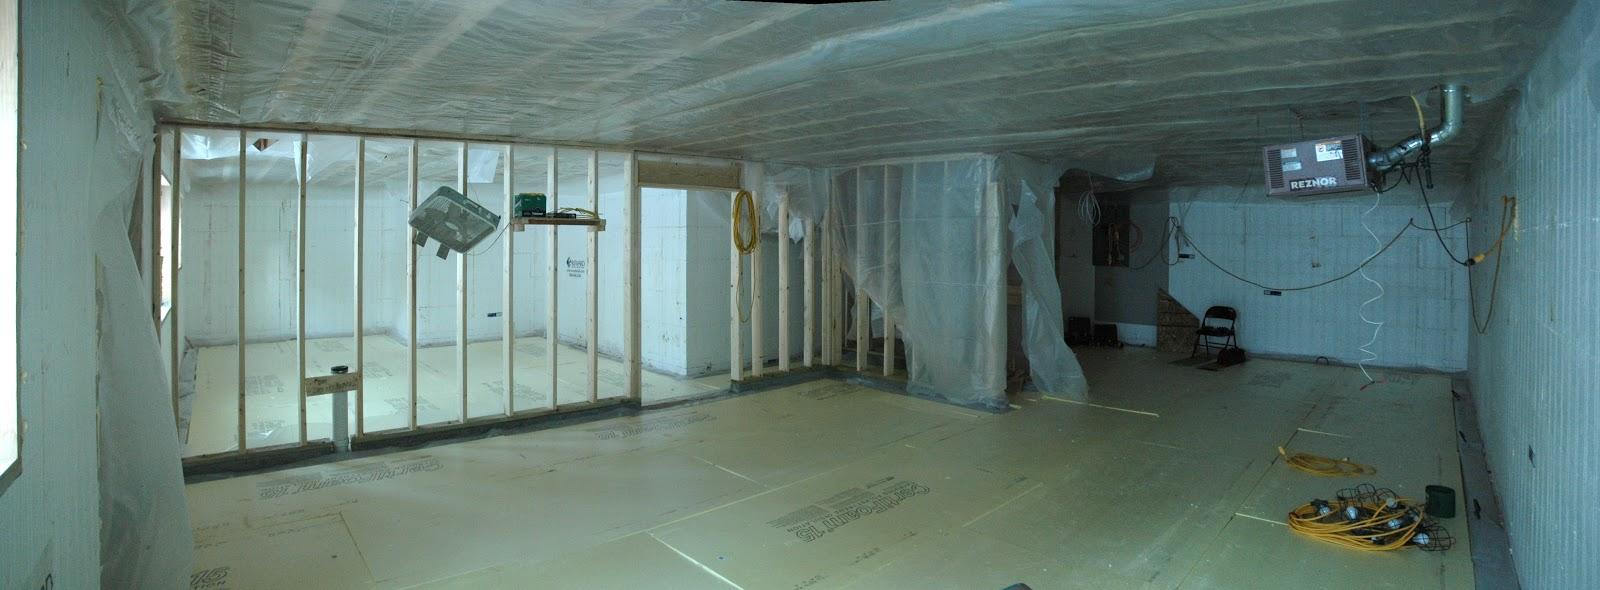 David 39 s icf home build basement for Icf basement